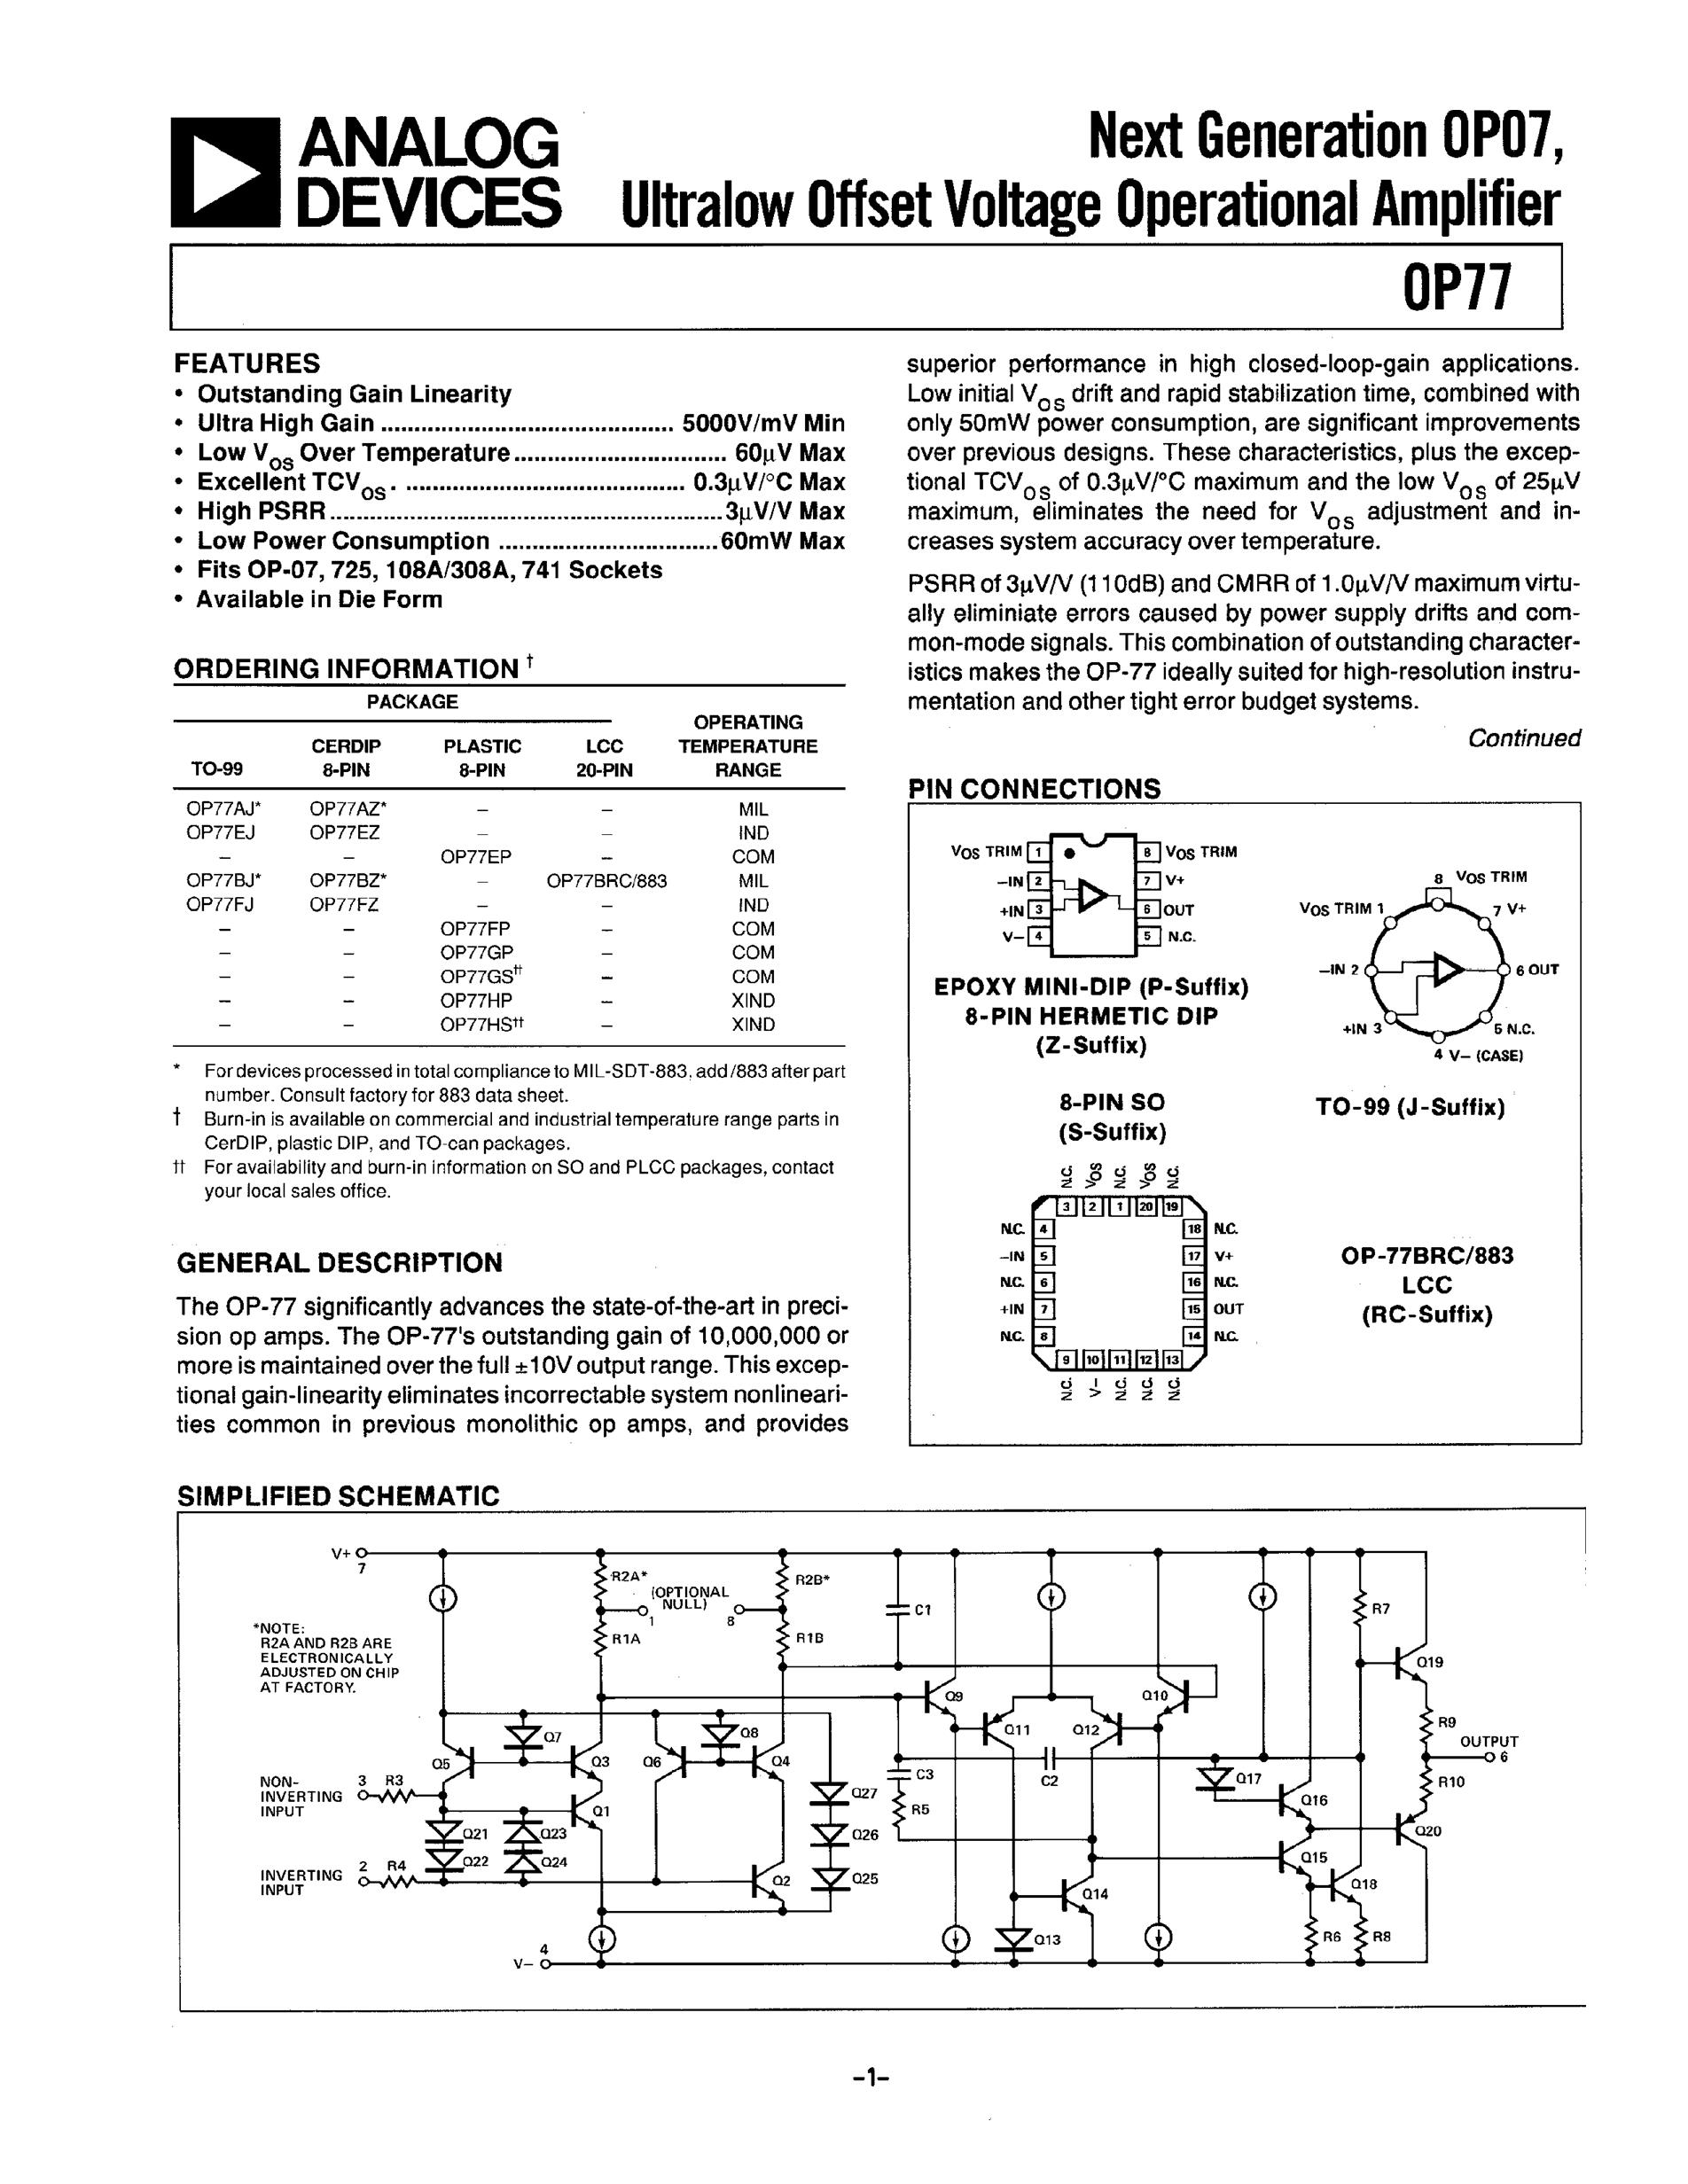 OP777ARZ's pdf picture 1